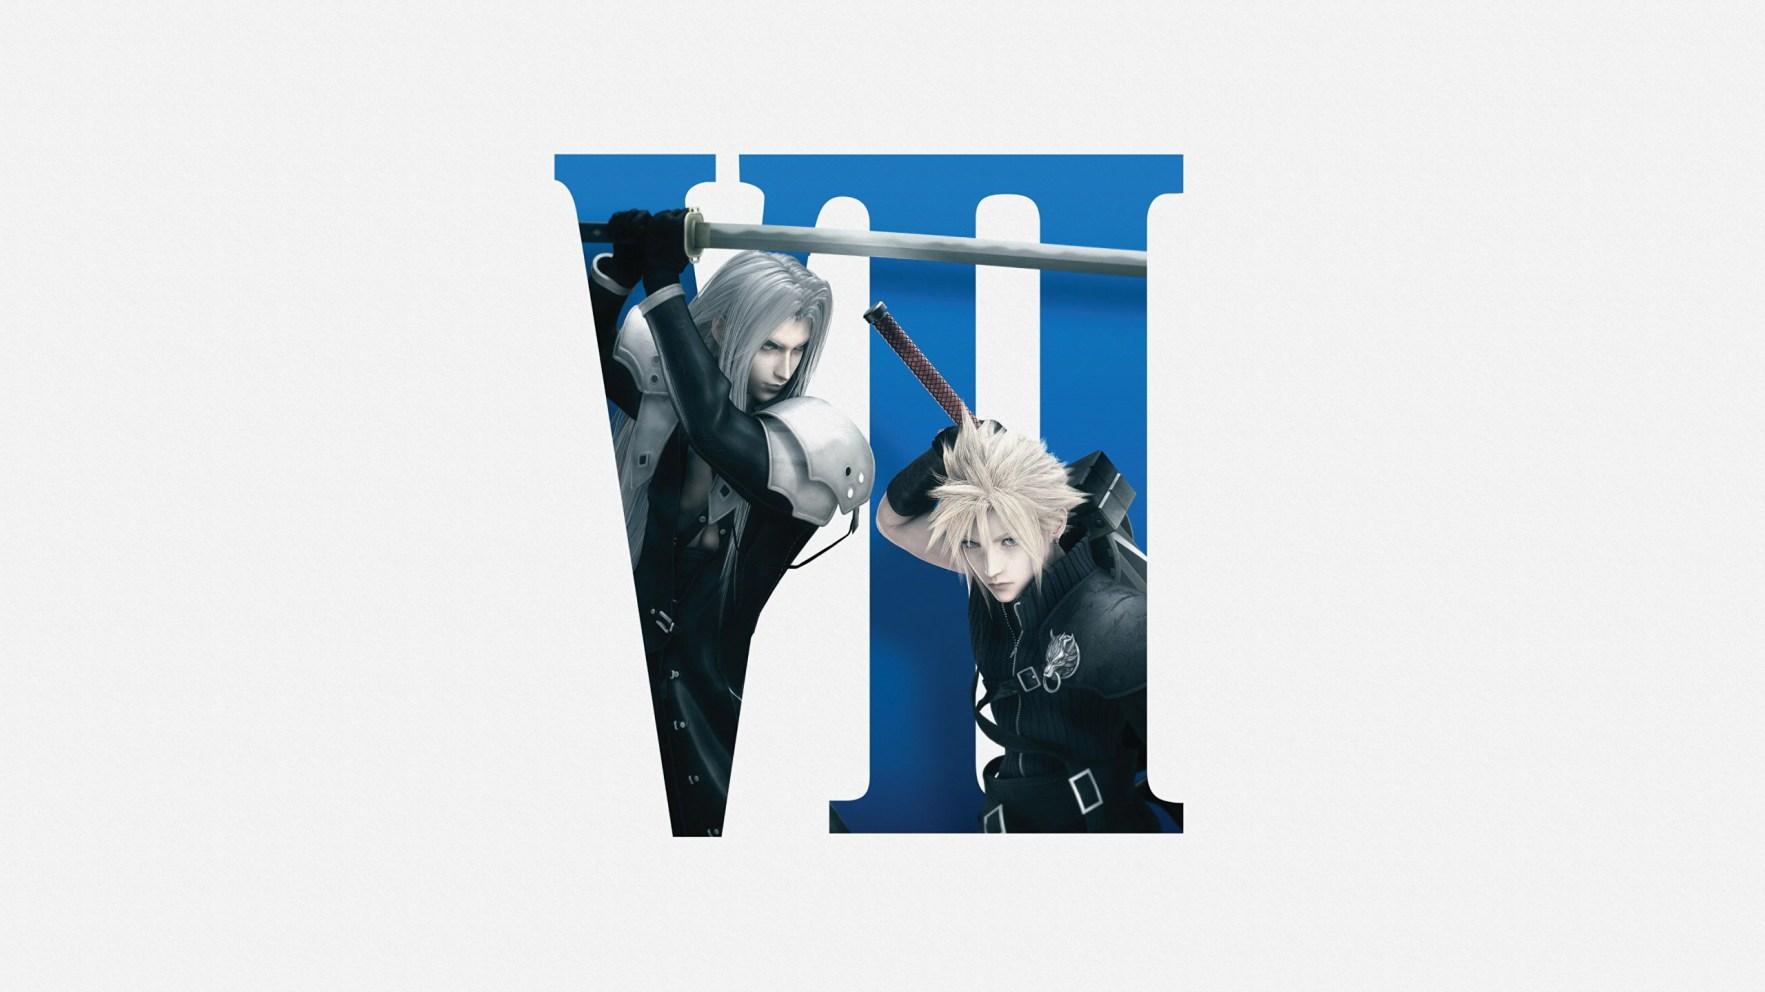 Get A Fancy Final Fantasy VII Wallpaper Featuring New CGI Artwork SQUARE PORTAL